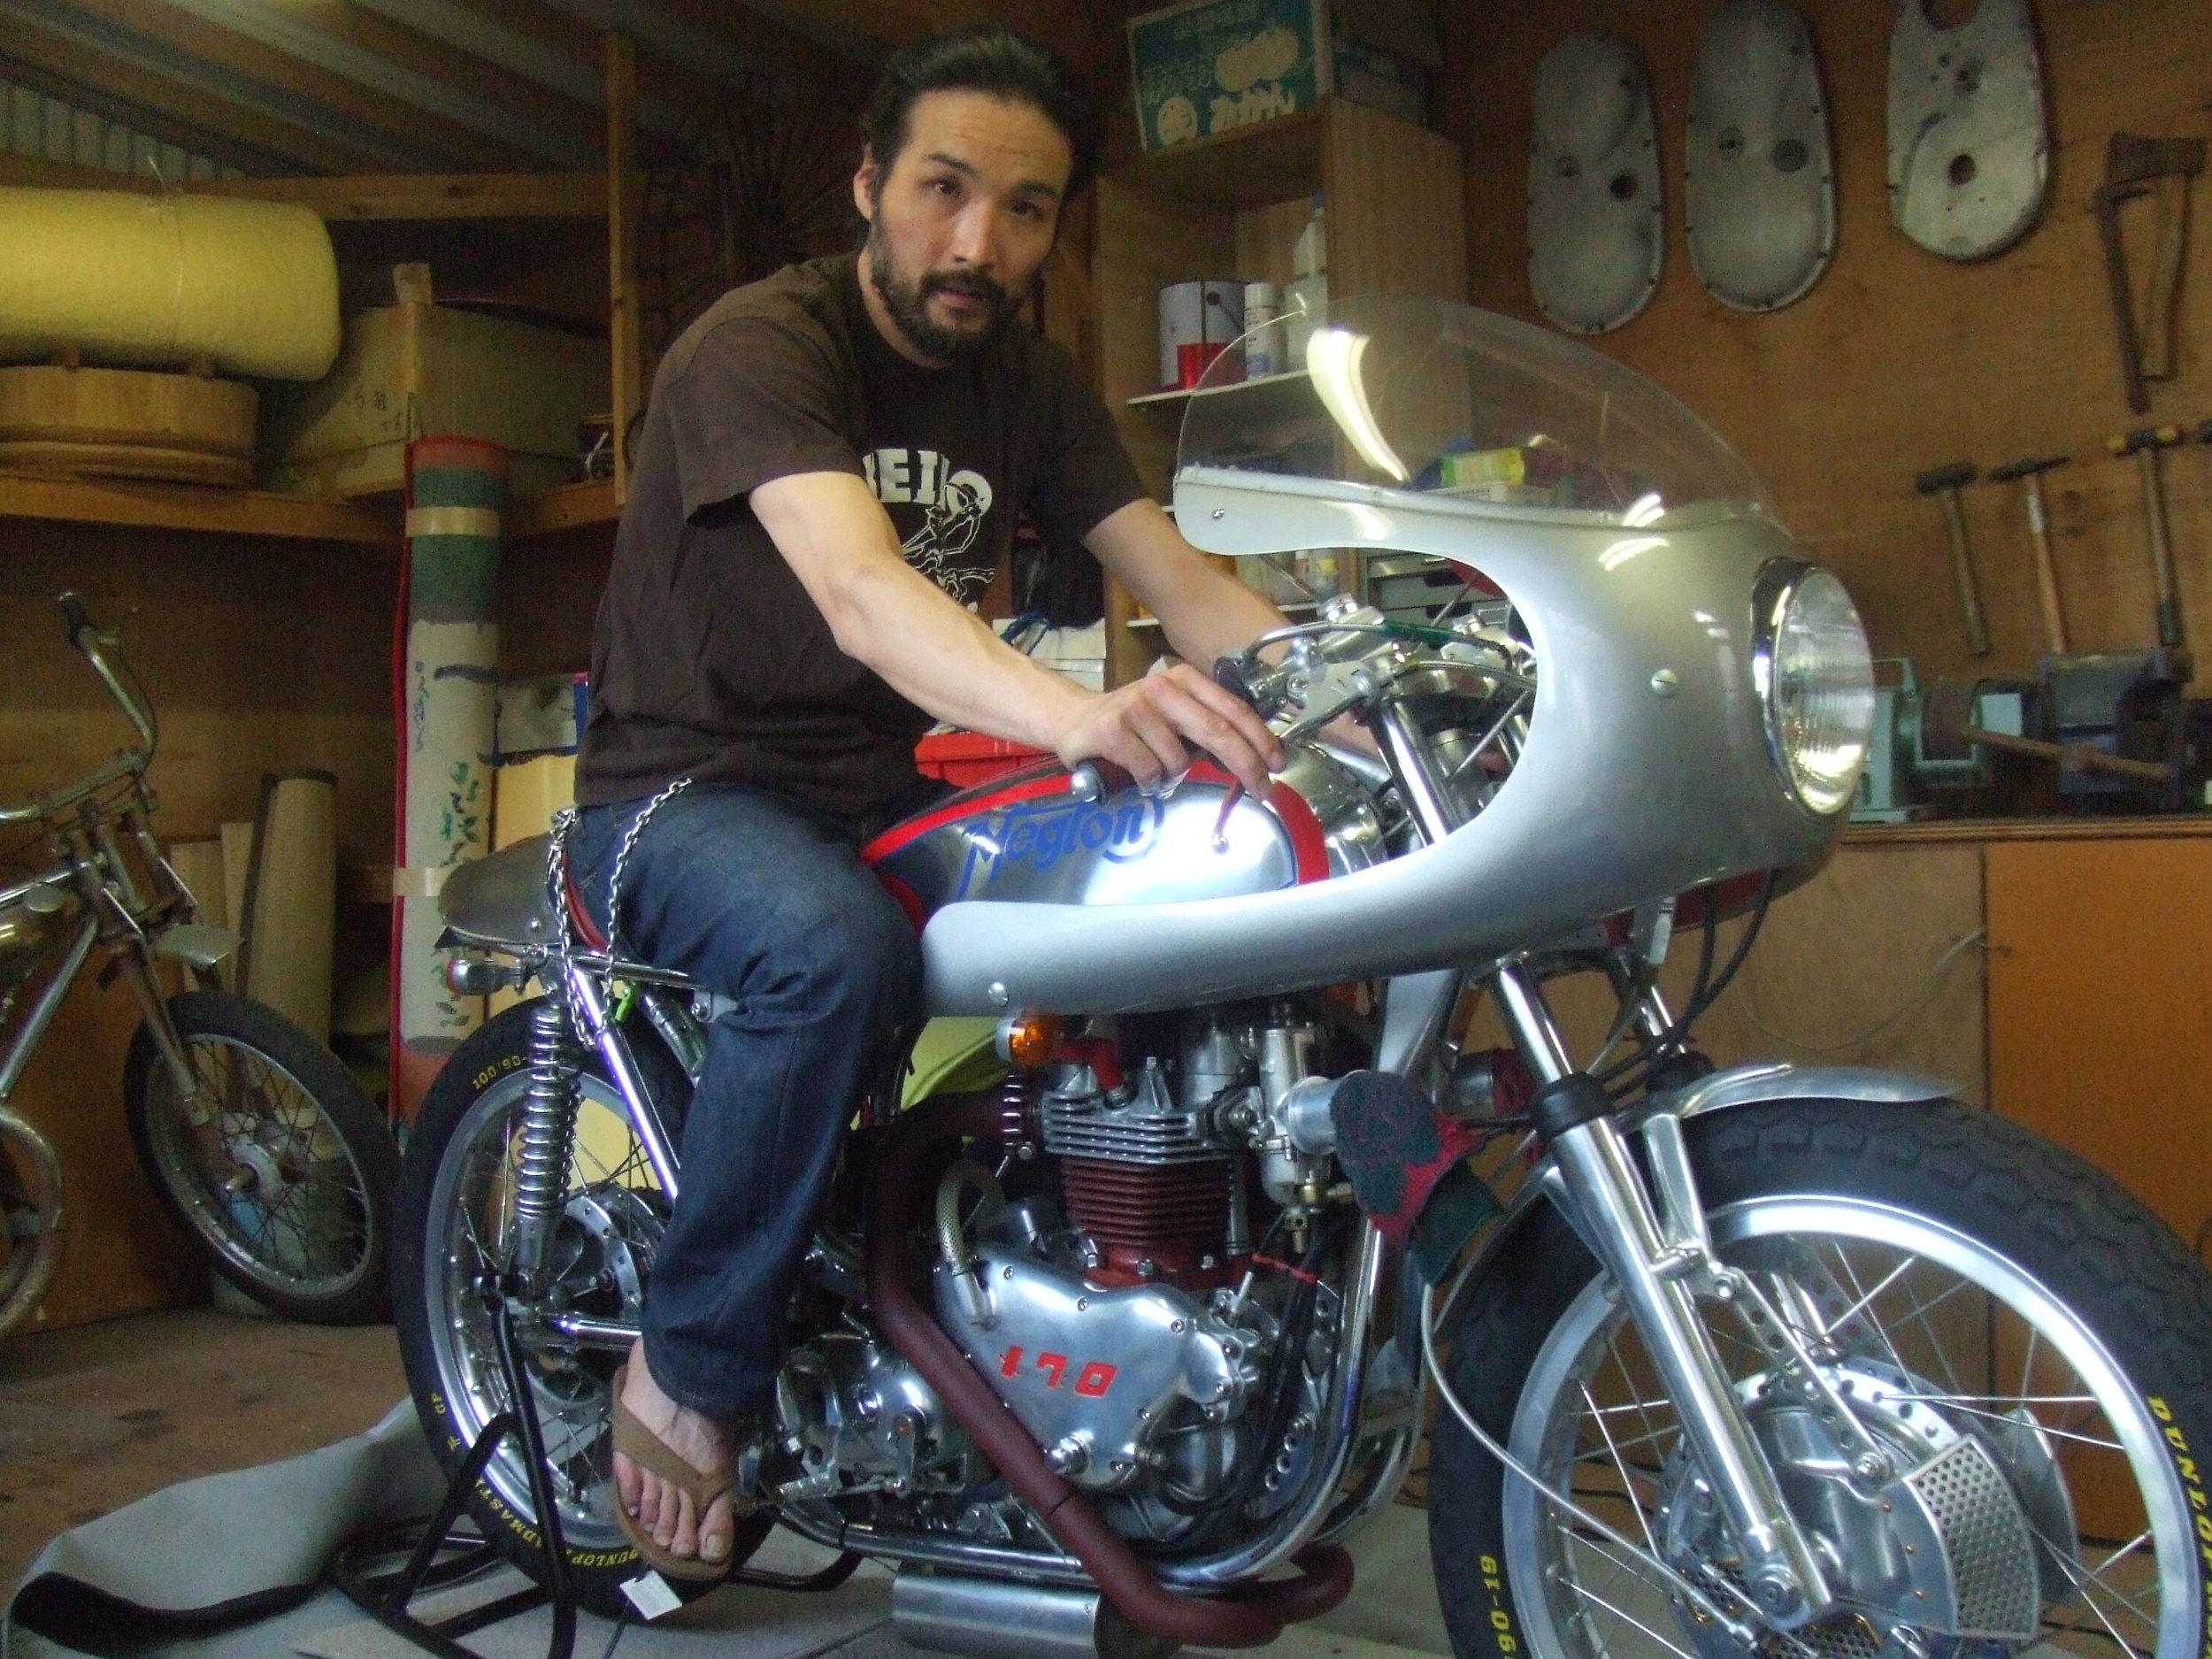 Father's last bike MEGTON, Meguro (aka Kawasaki) in Norton frame